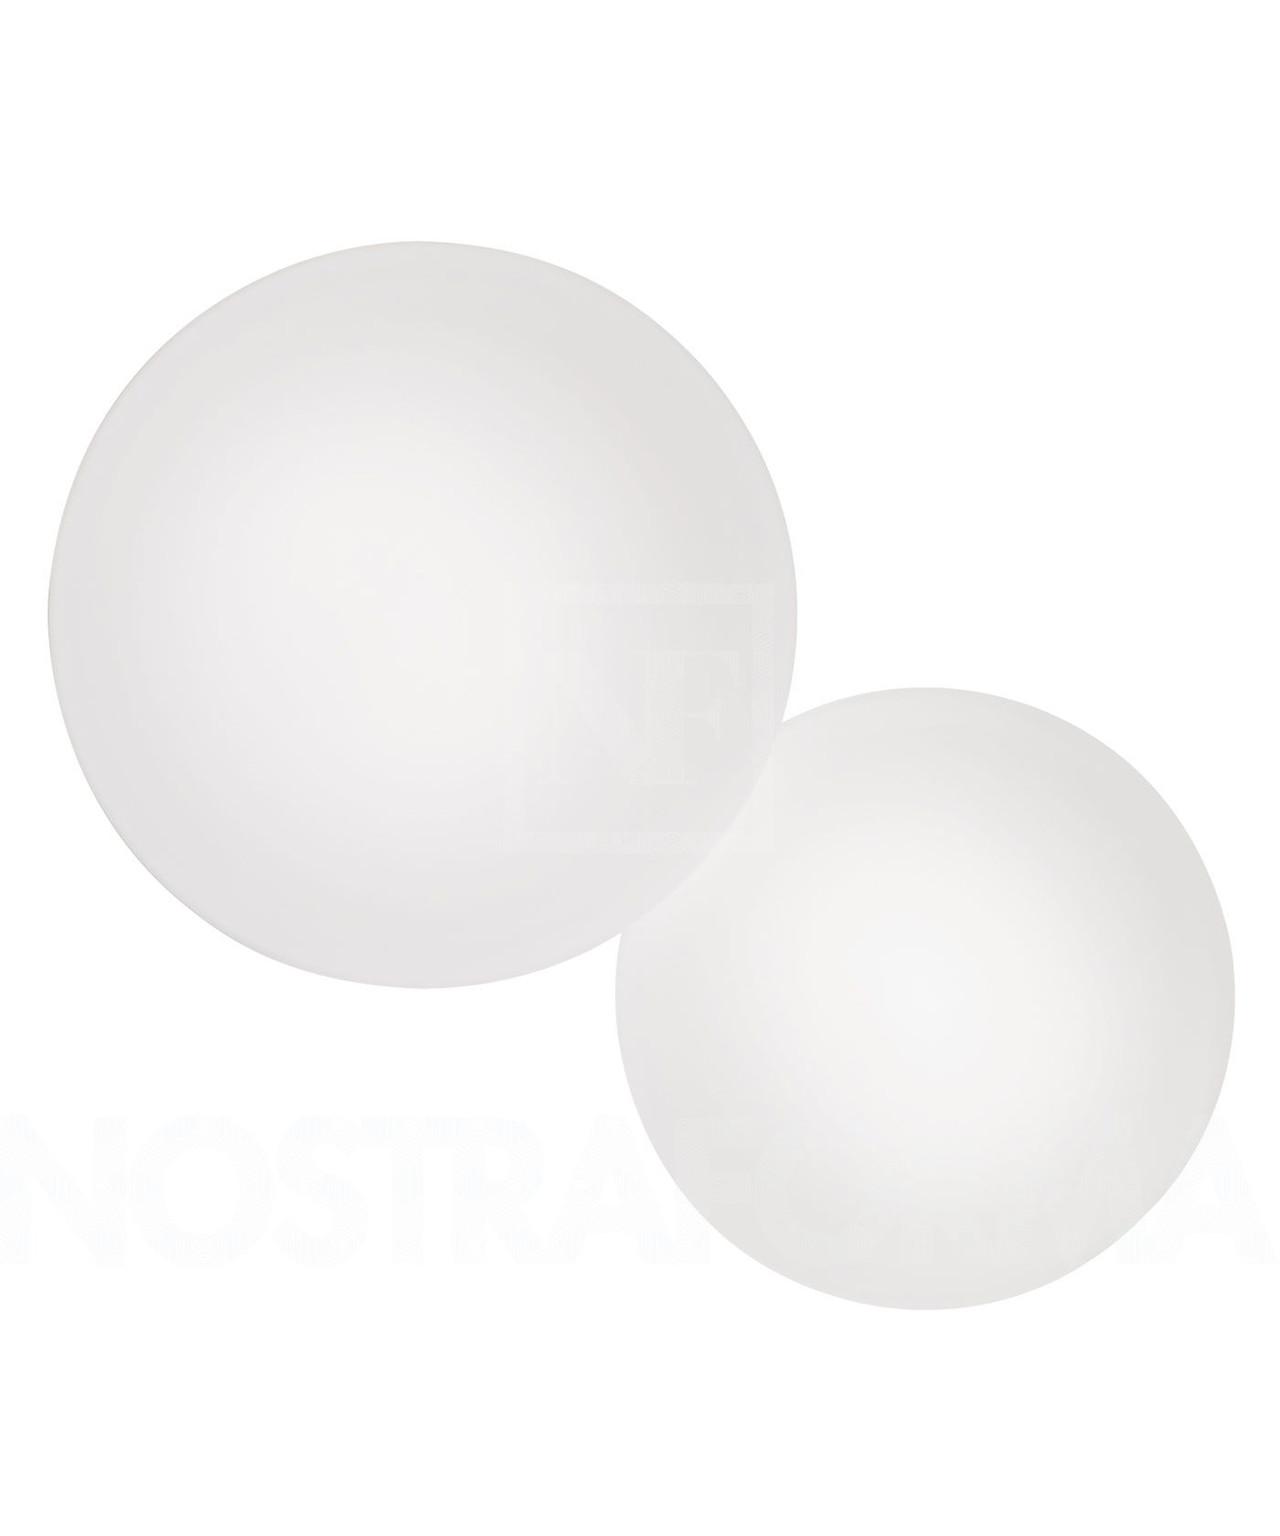 Puck 2 Væglampe/Loftlampe LED - Vibia thumbnail